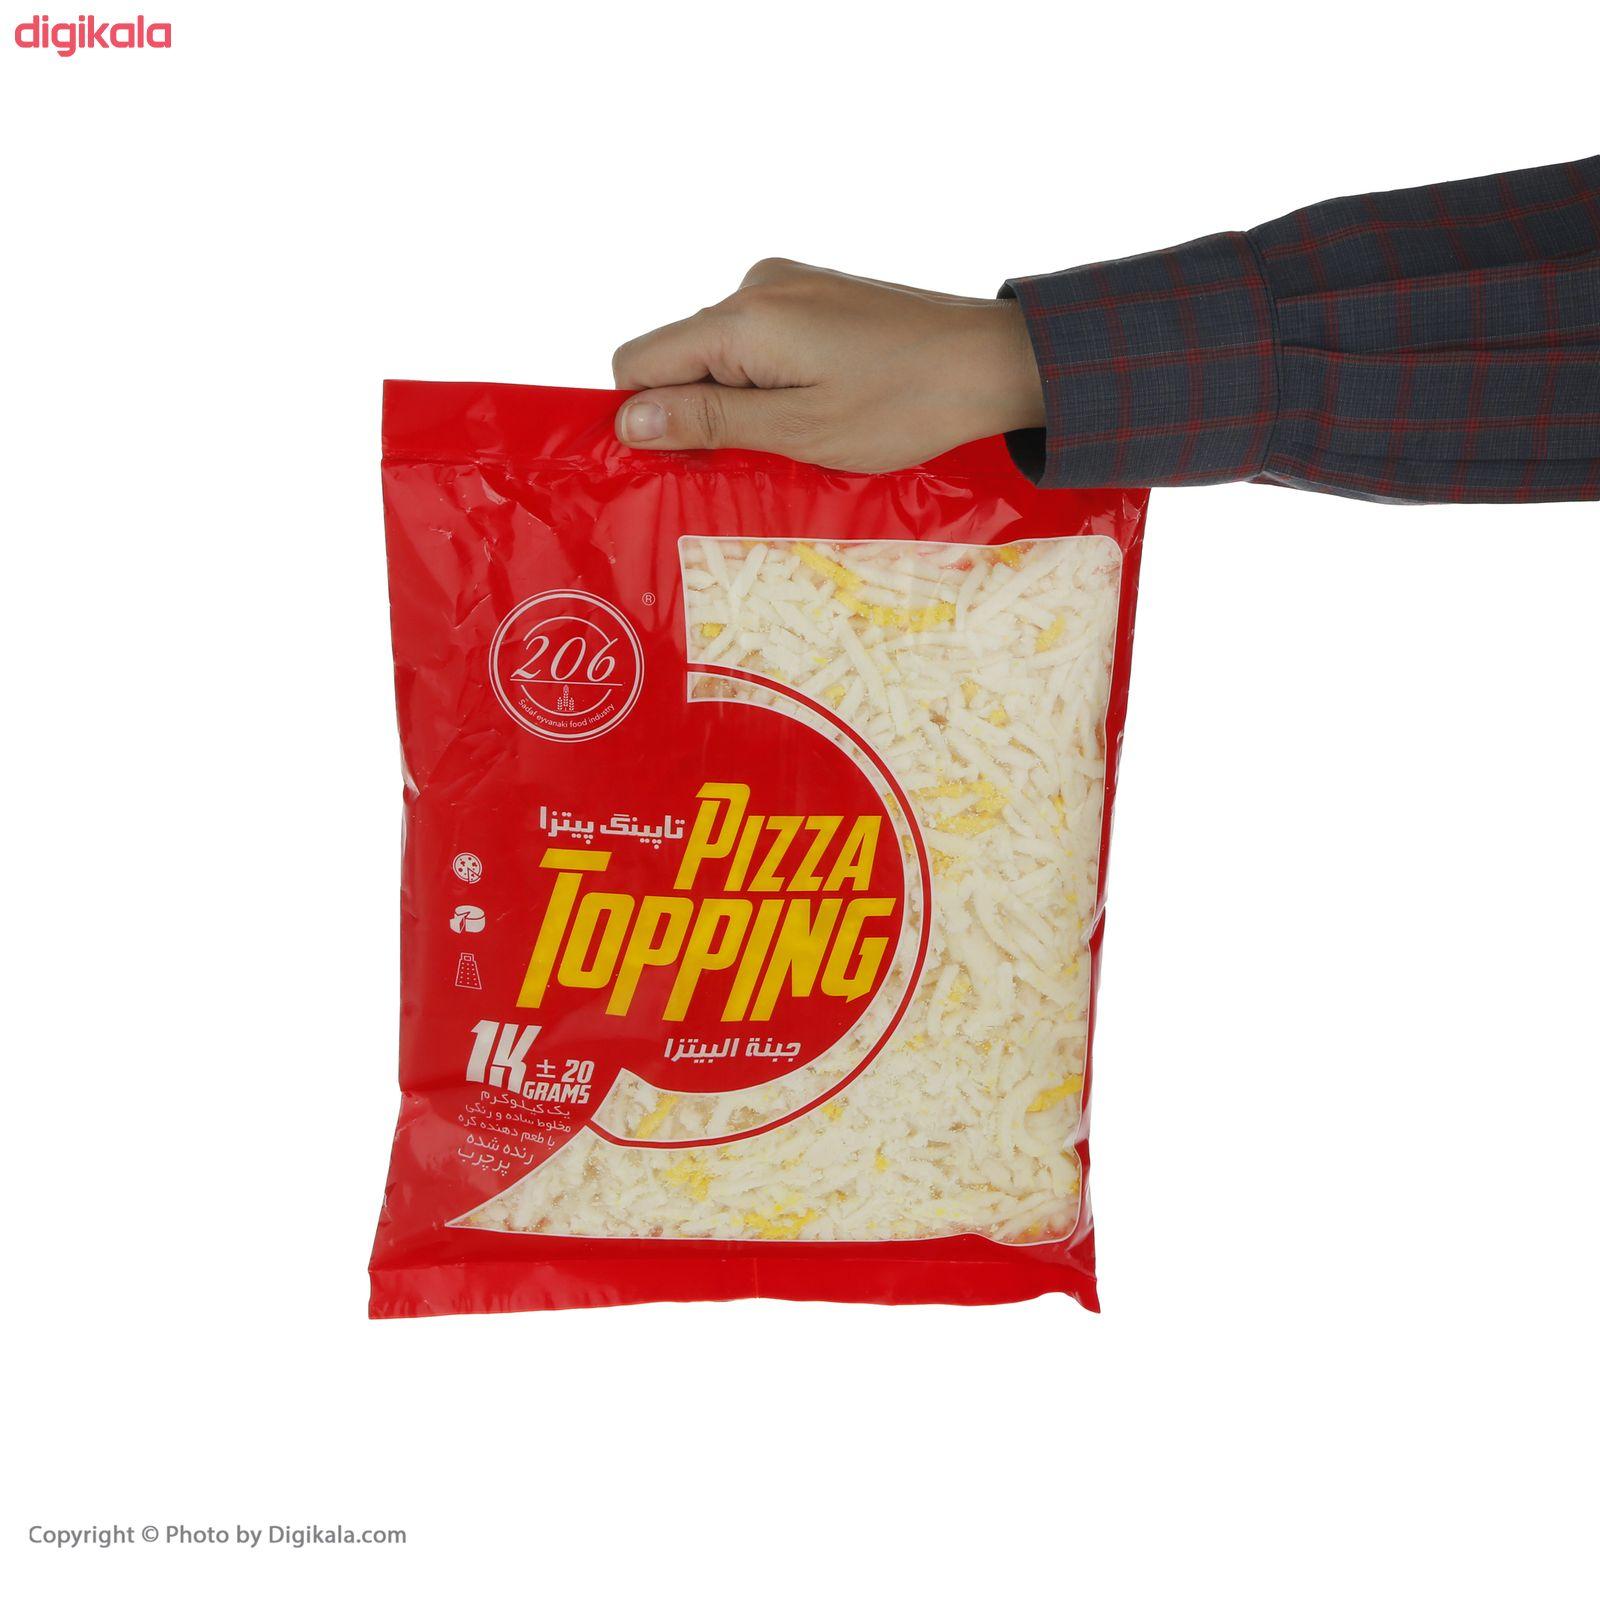 پنیر پیتزا رنده شده 206 - 1 کیلوگرم main 1 3